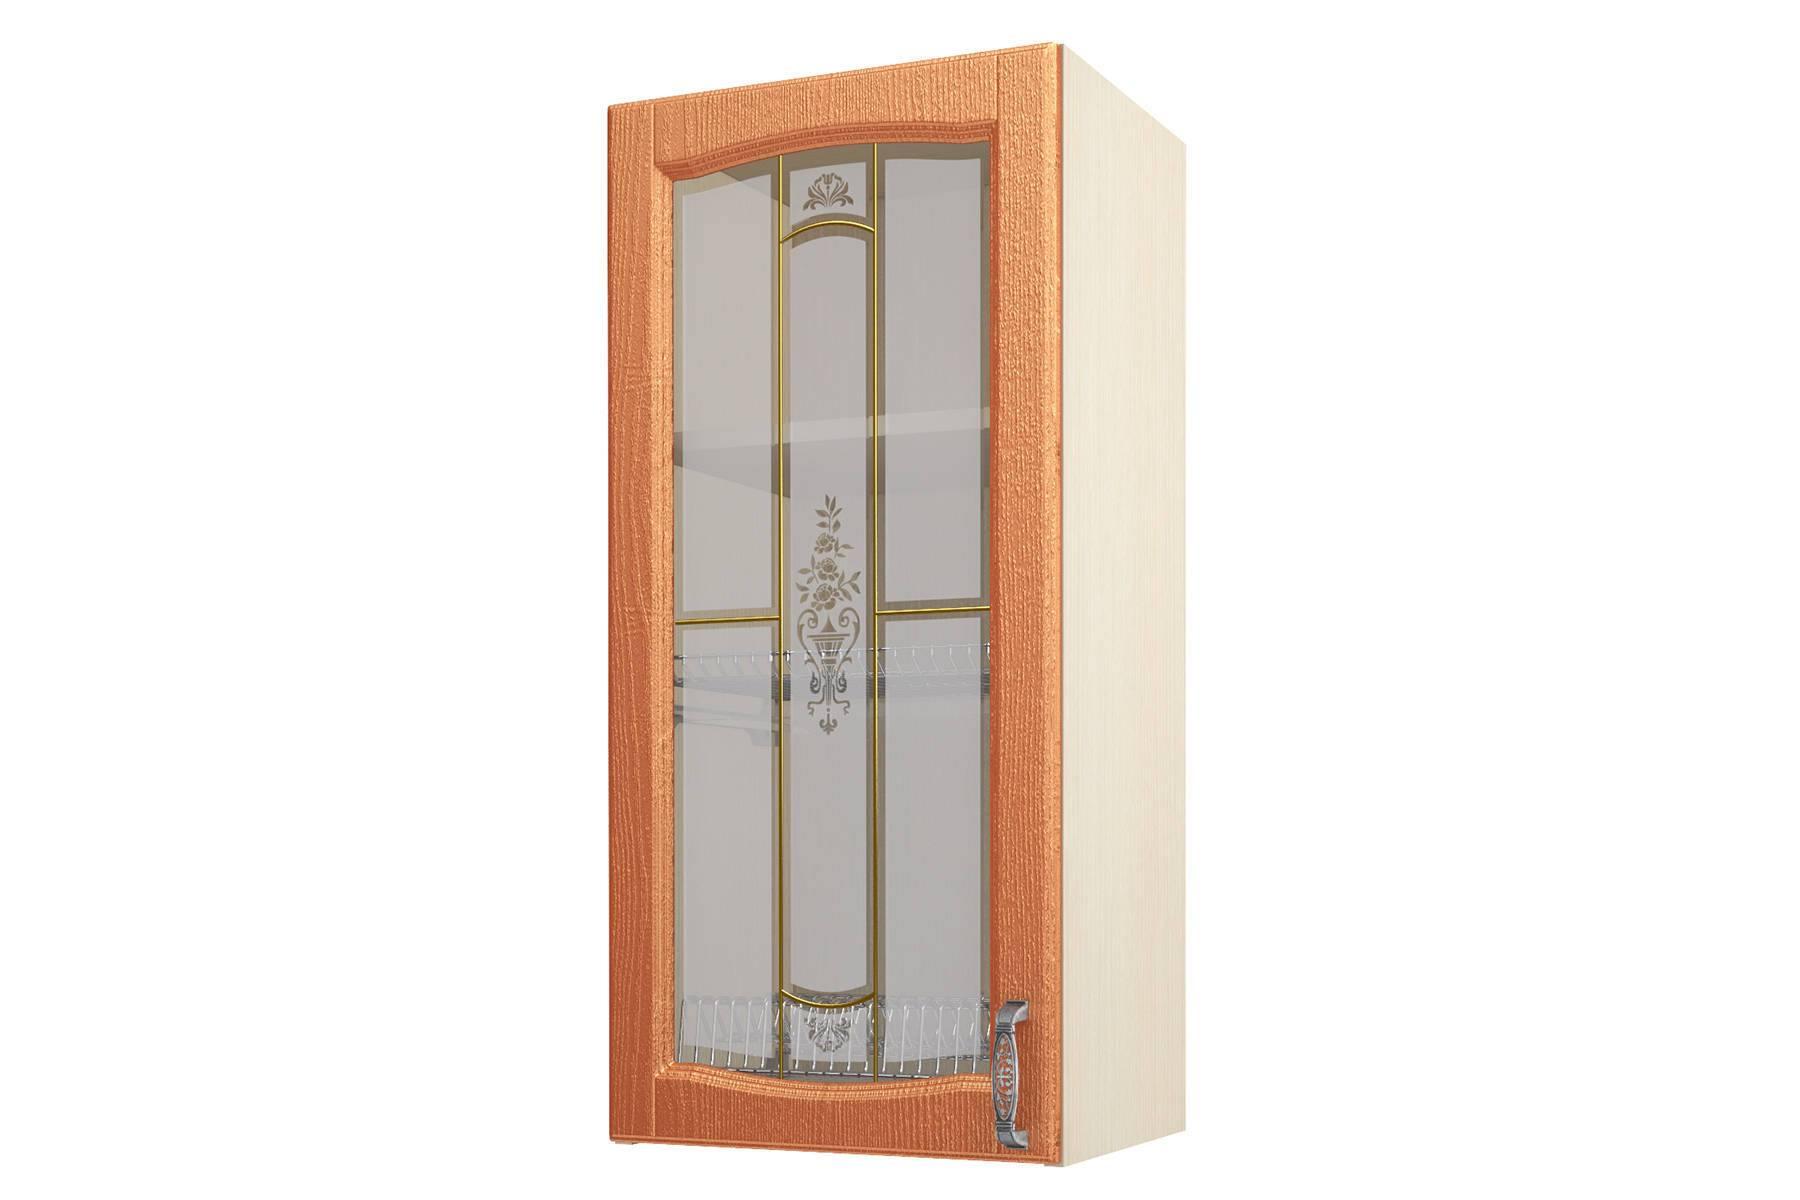 Равенна ART Шкаф-сушка-витрина 45 (Н-96), 1 дверь равенна art шкаф навесной 40 н 96 1 дверь